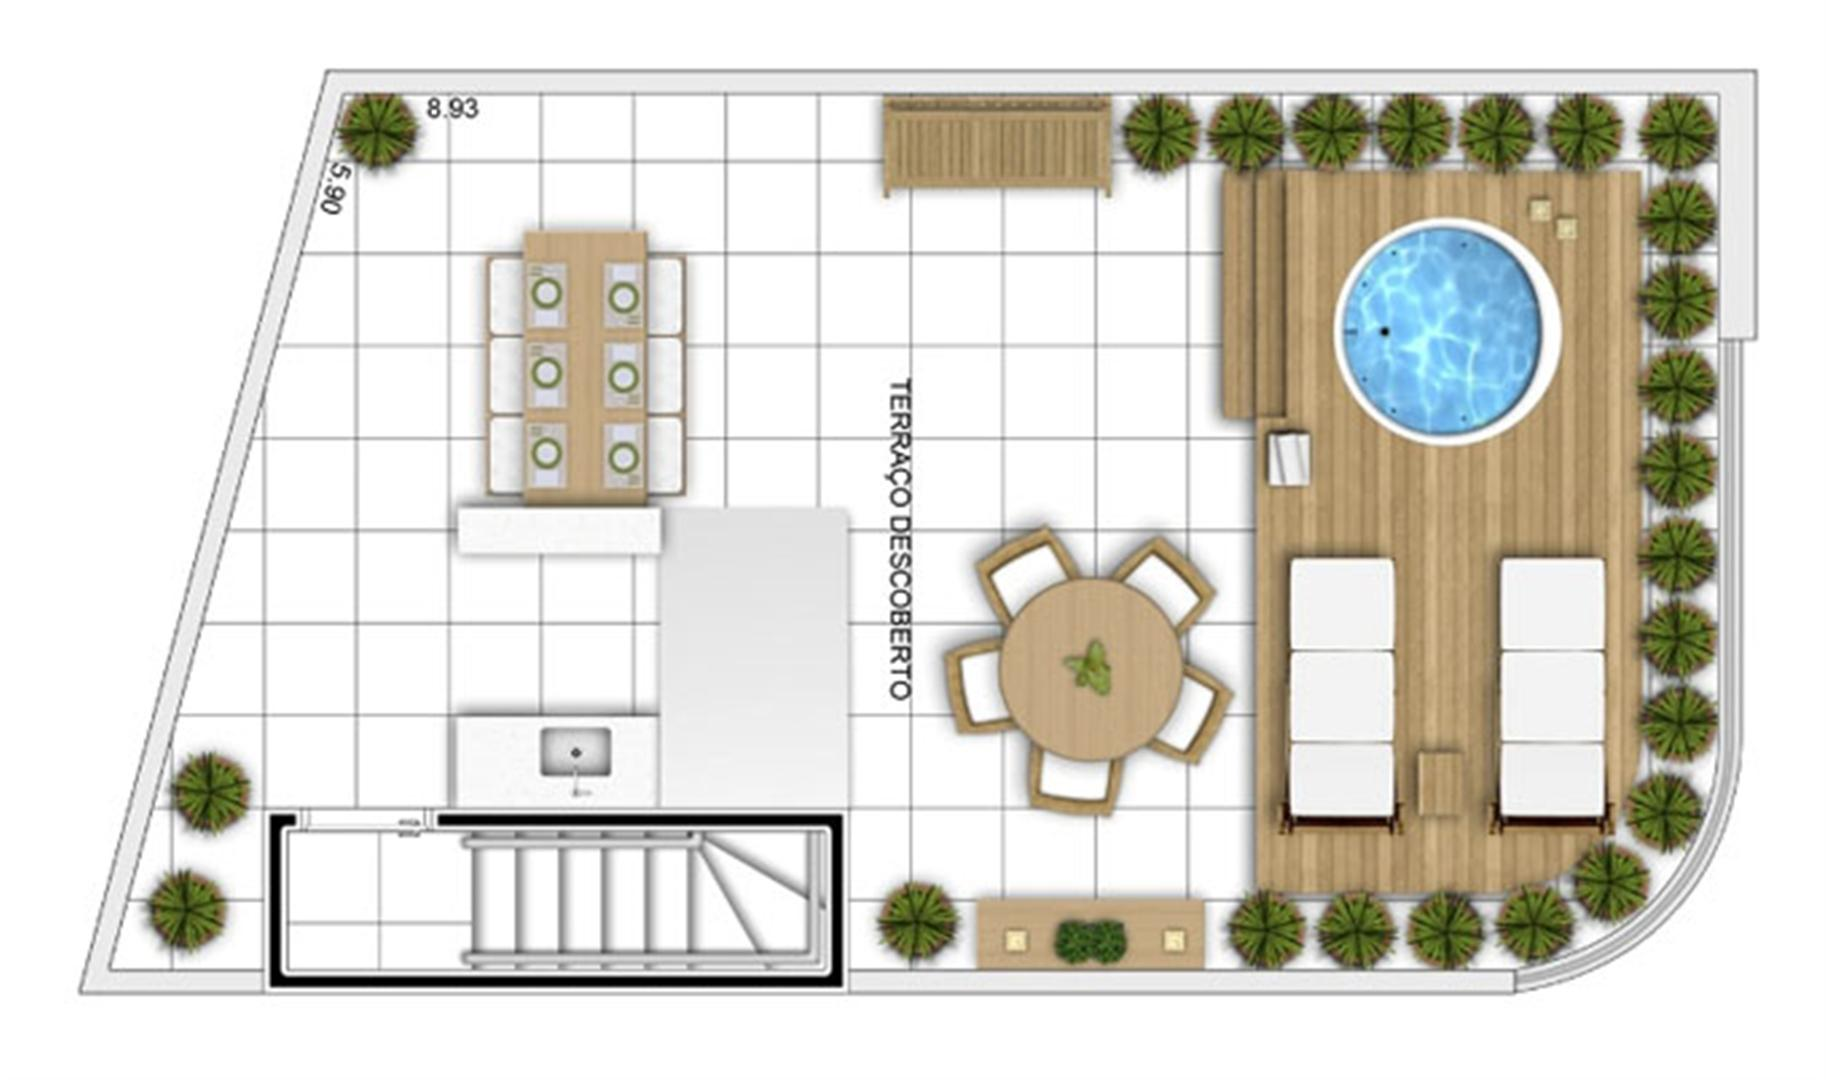 PLANTA - APTO TIPO C - DUPLEX SUPERIOR - 114 m²  | In Mare Bali – Apartamento no  Distrito Litoral de Cotovelo - Parnamirim - Rio Grande do Norte